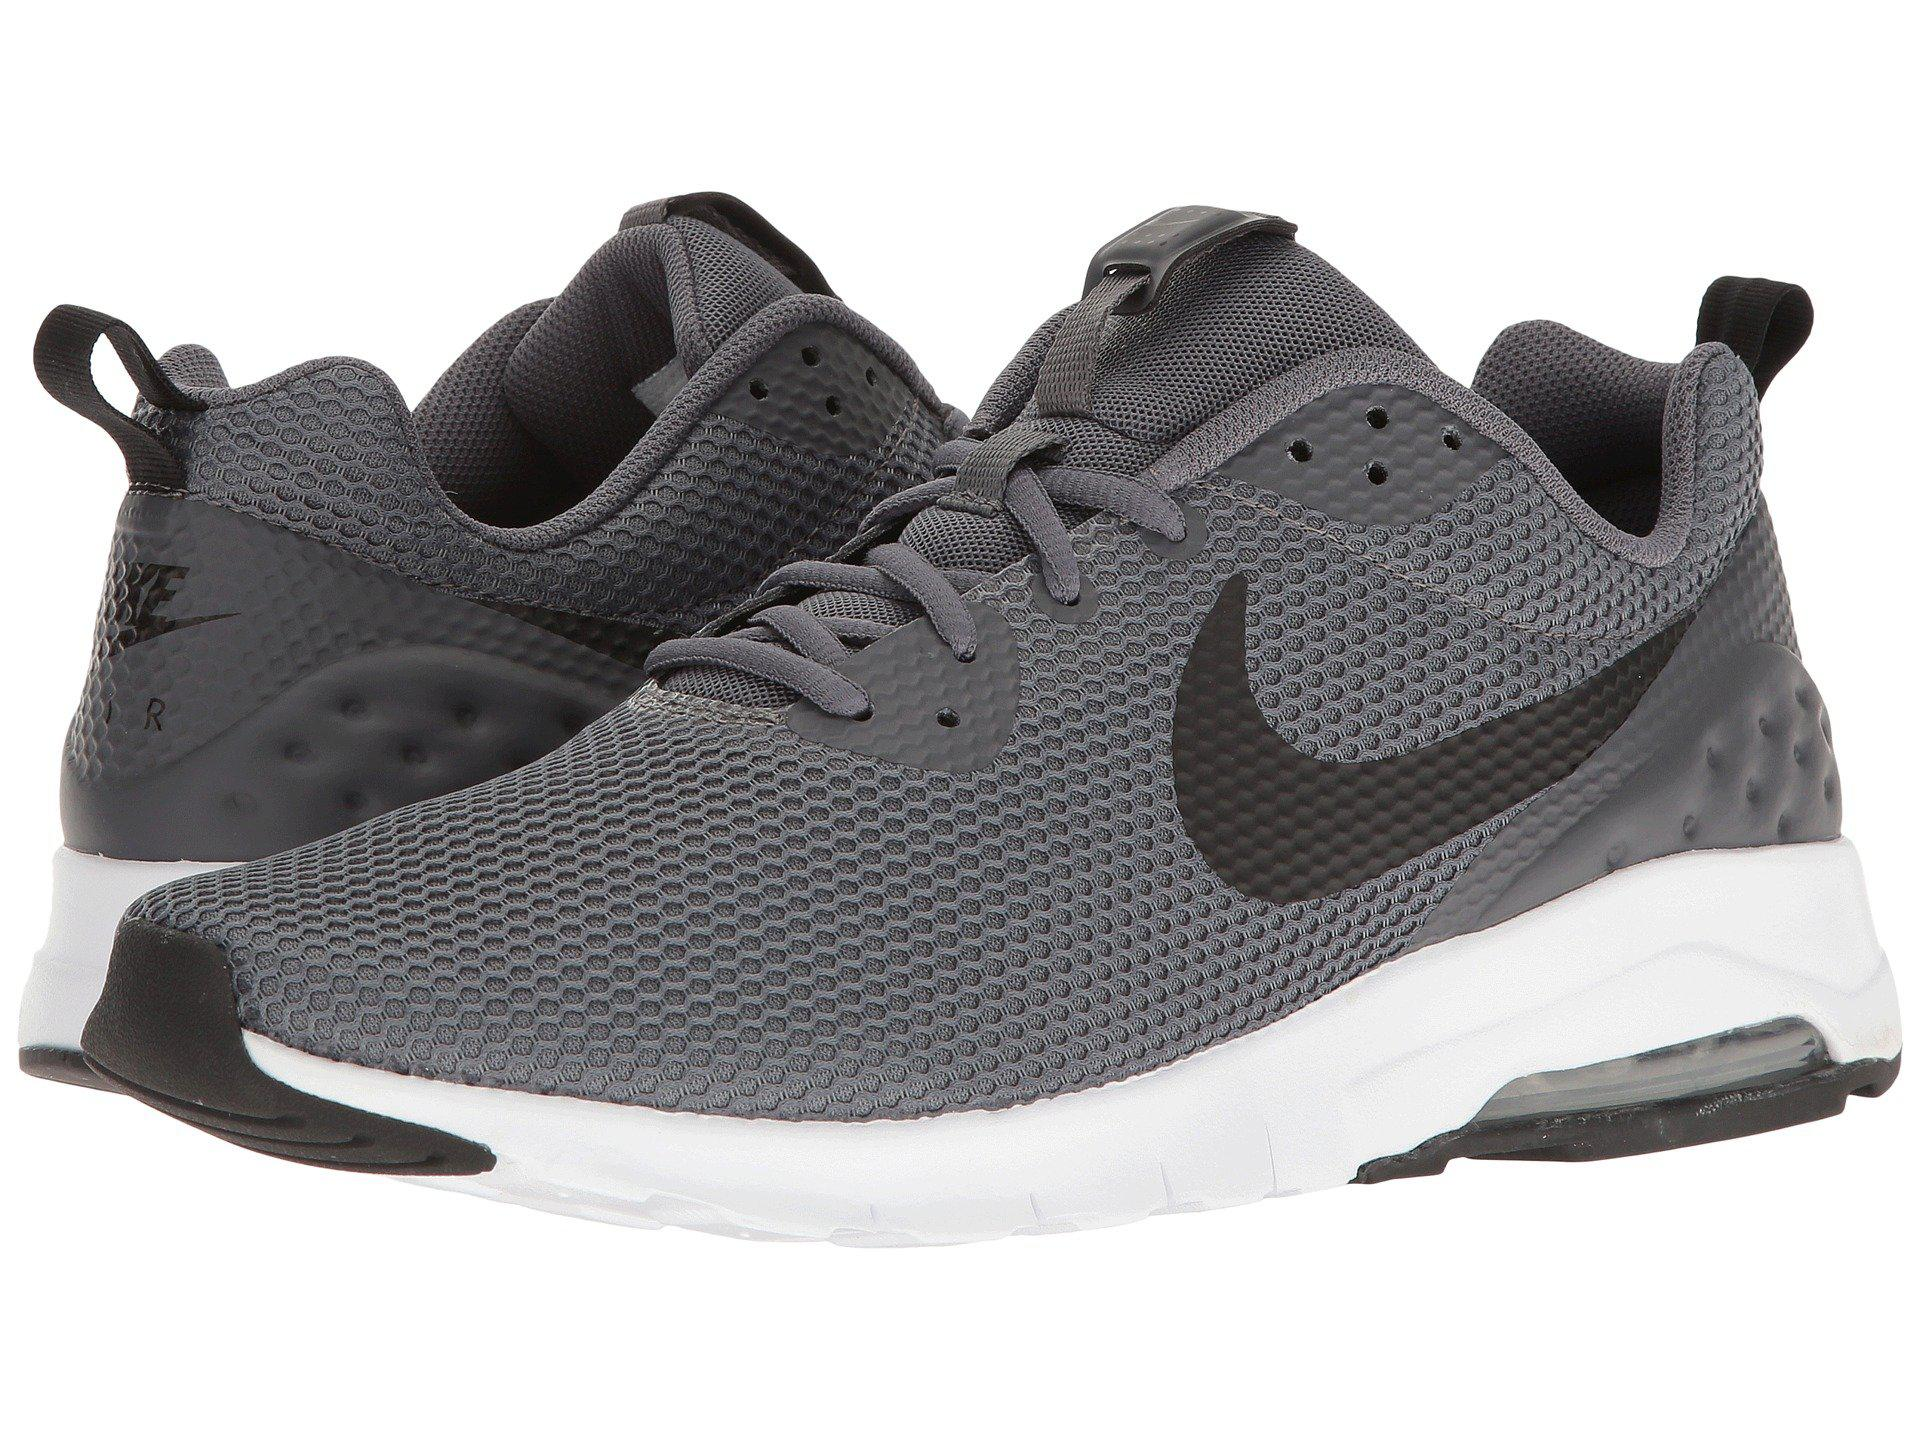 5330709eda Nike Air Max Motion Low Se in Gray for Men - Lyst